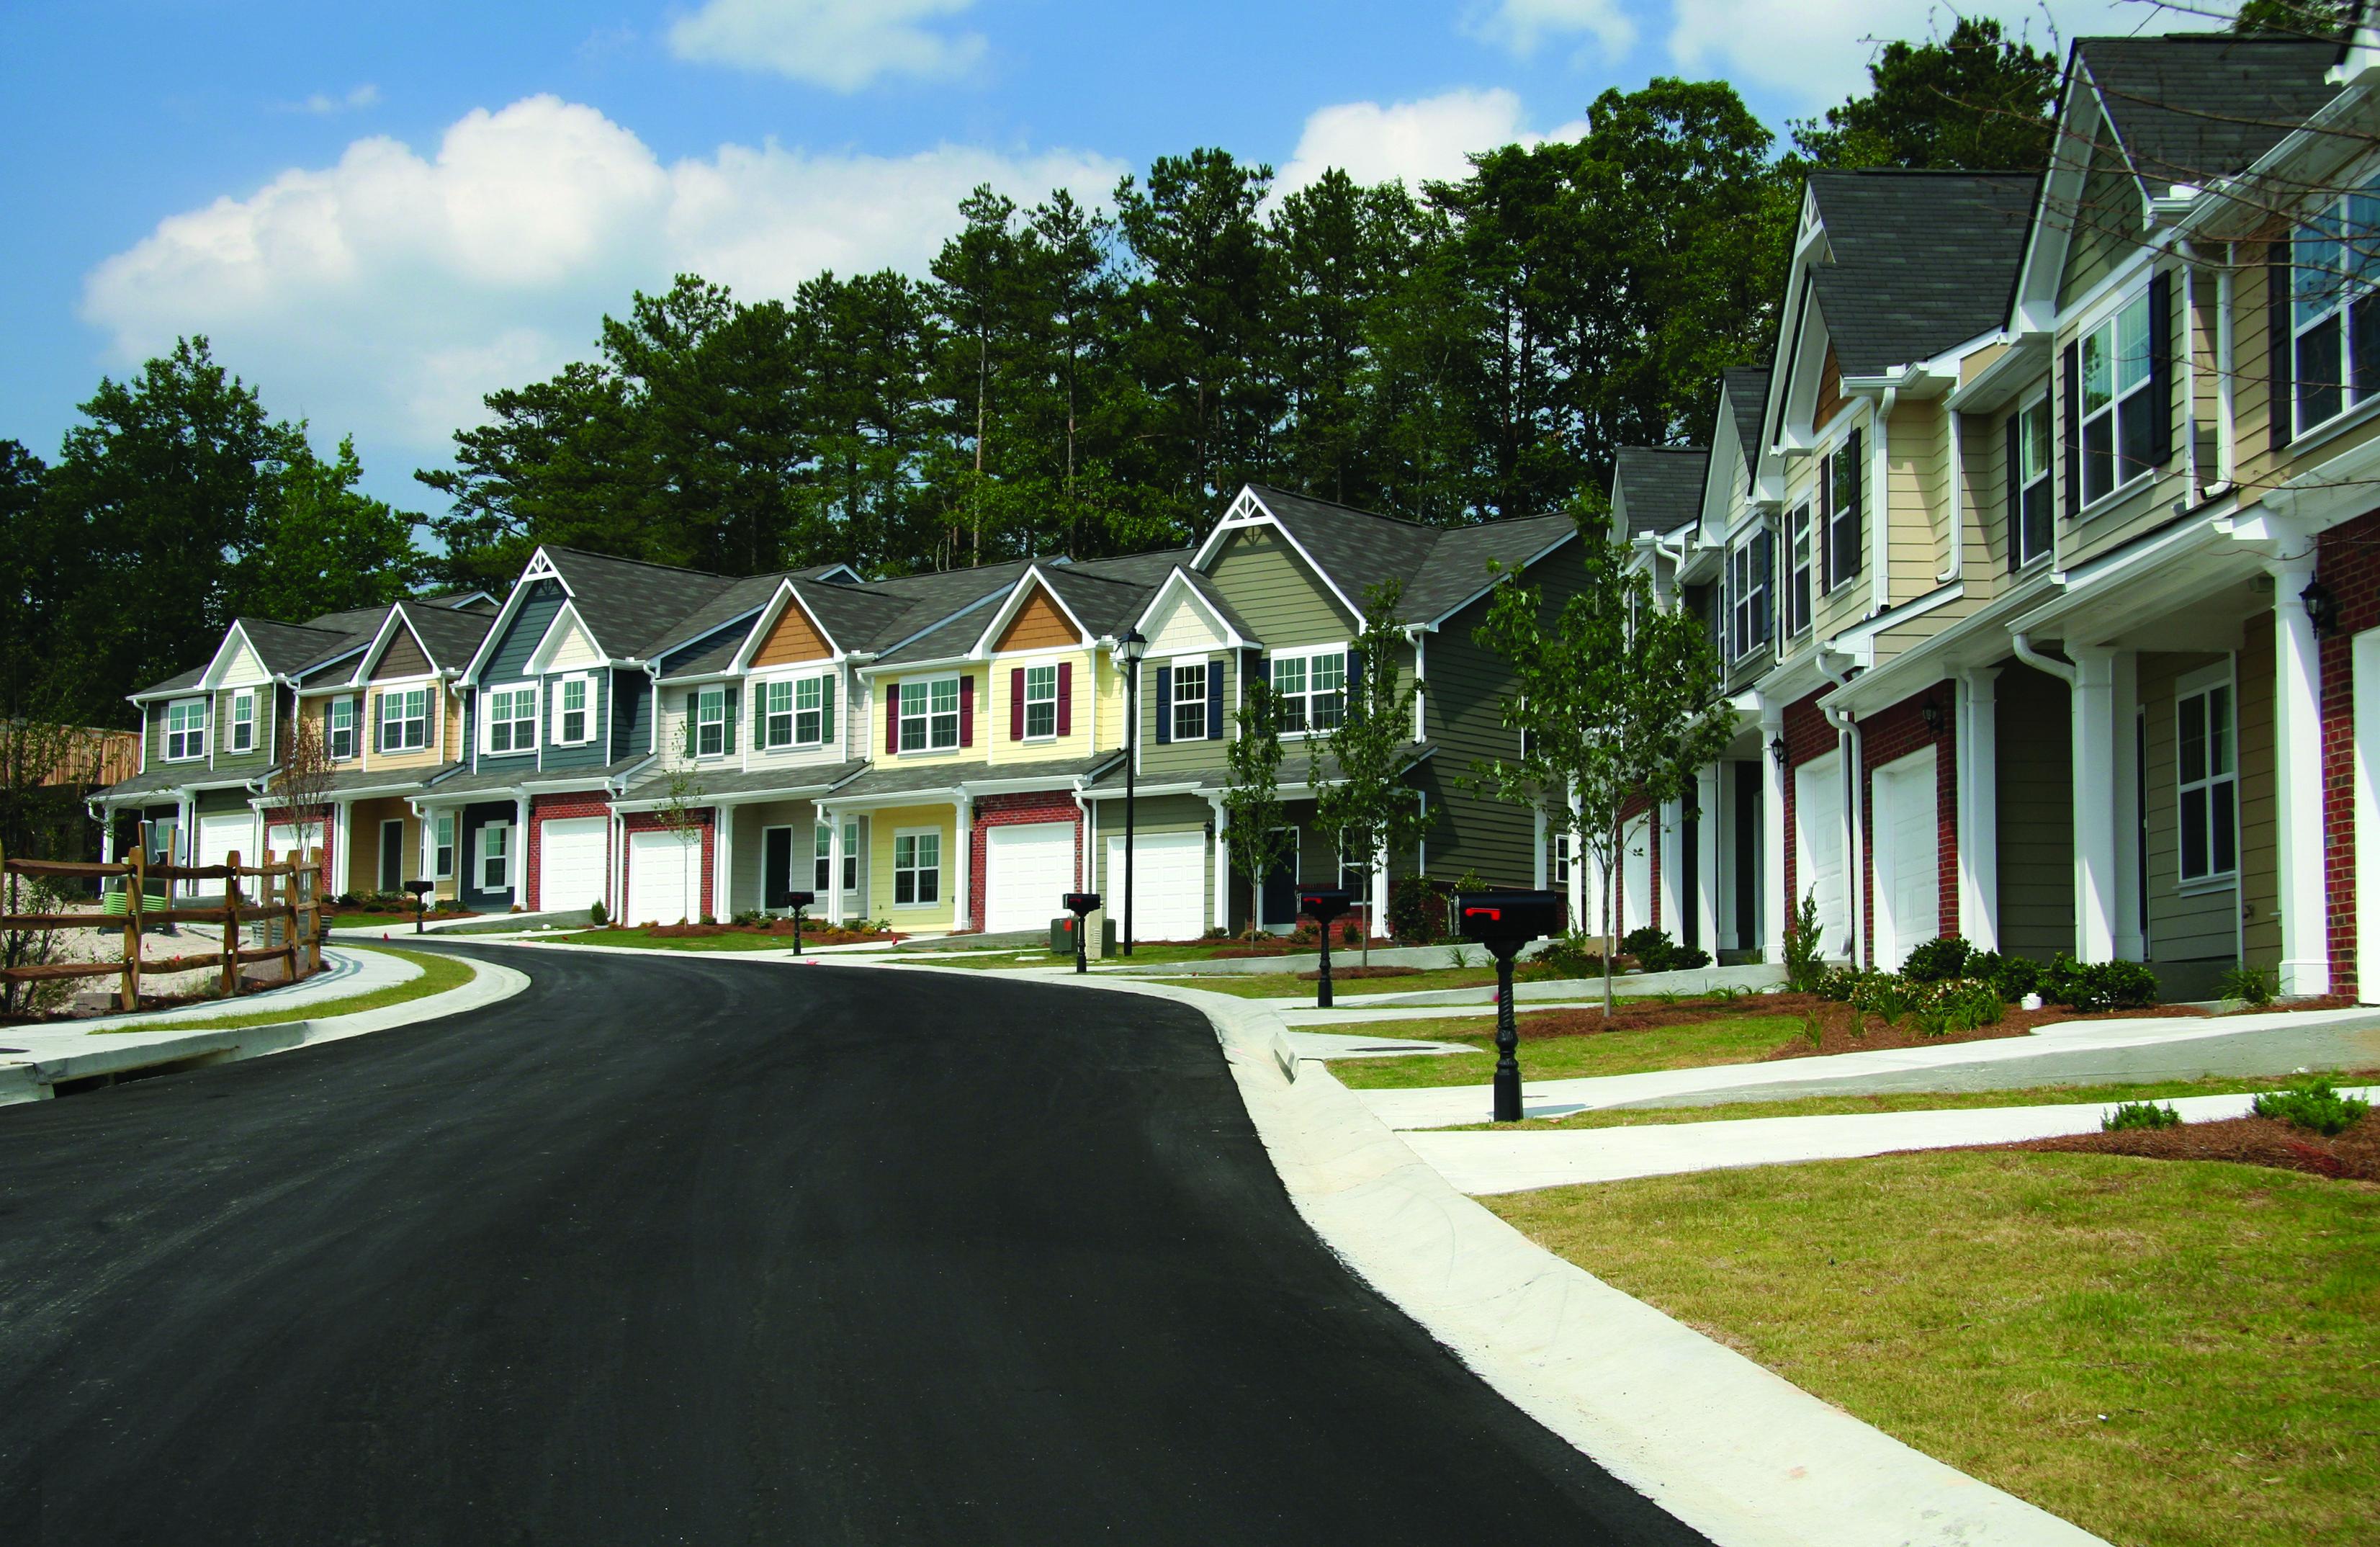 Street View of Rental Property